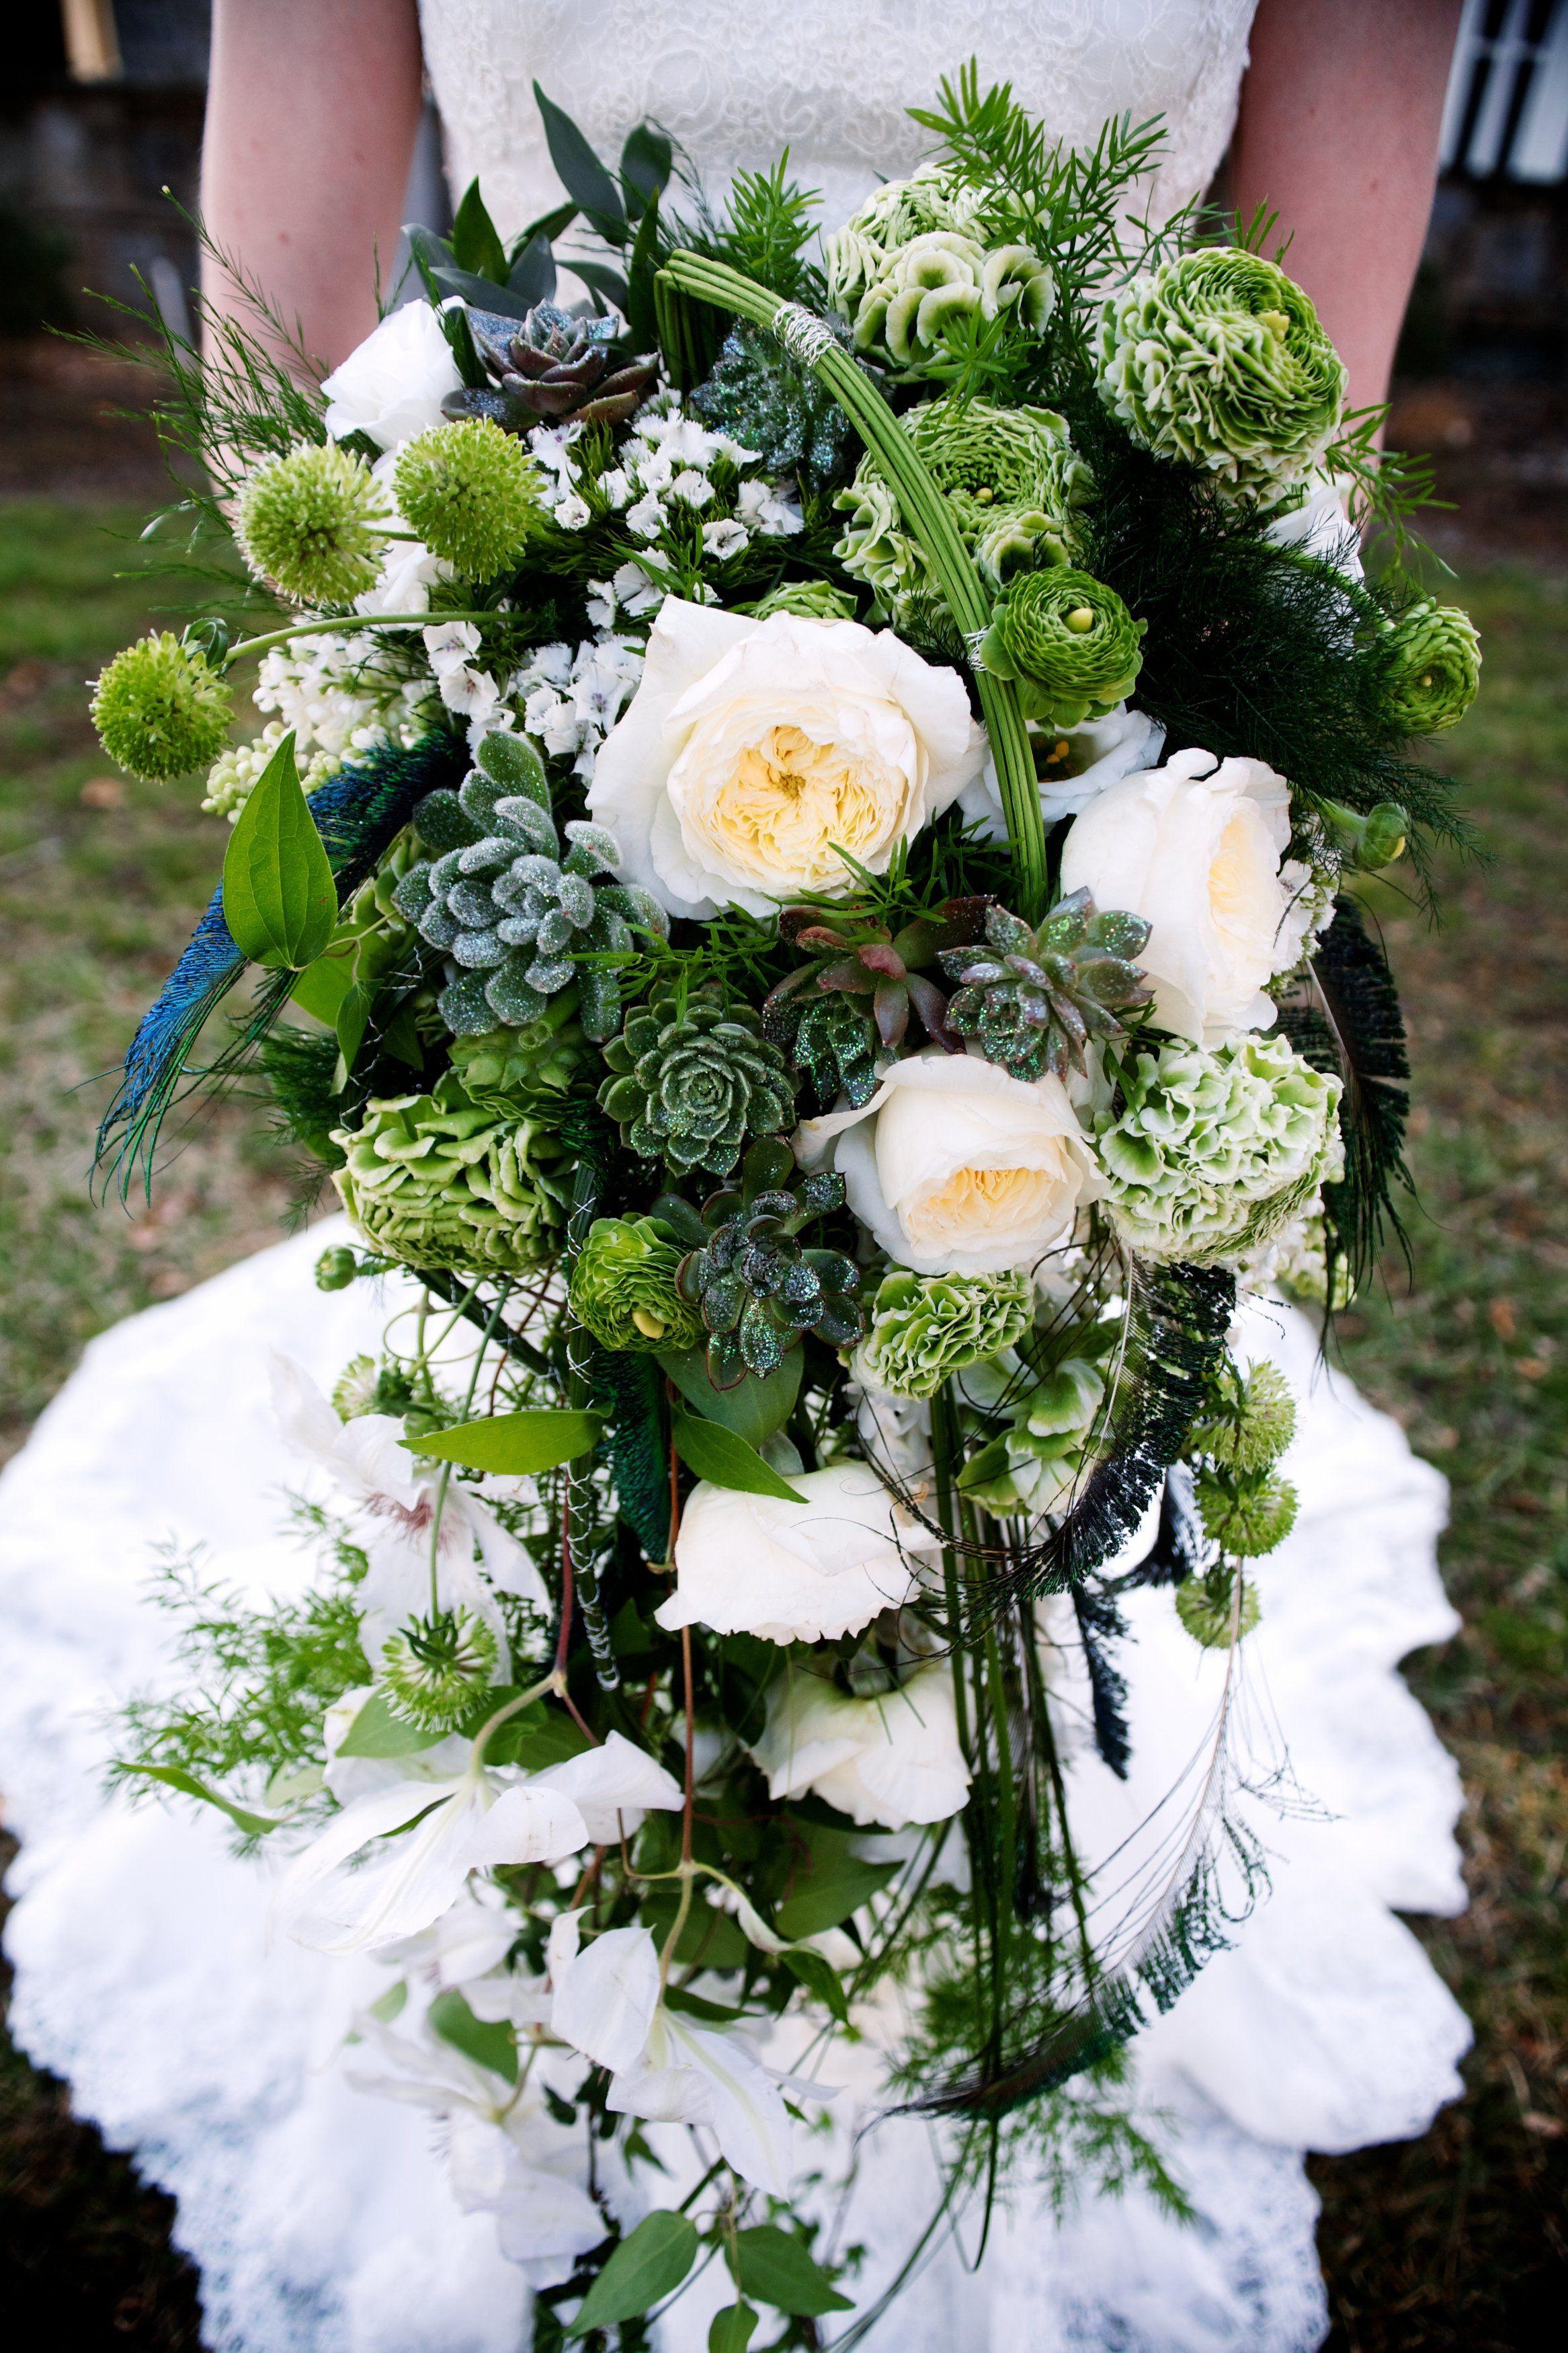 The Perfect Eucalyptus Color Haarkranz Hochzeit Blumenkranz Hochzeit Hochzeitskranze